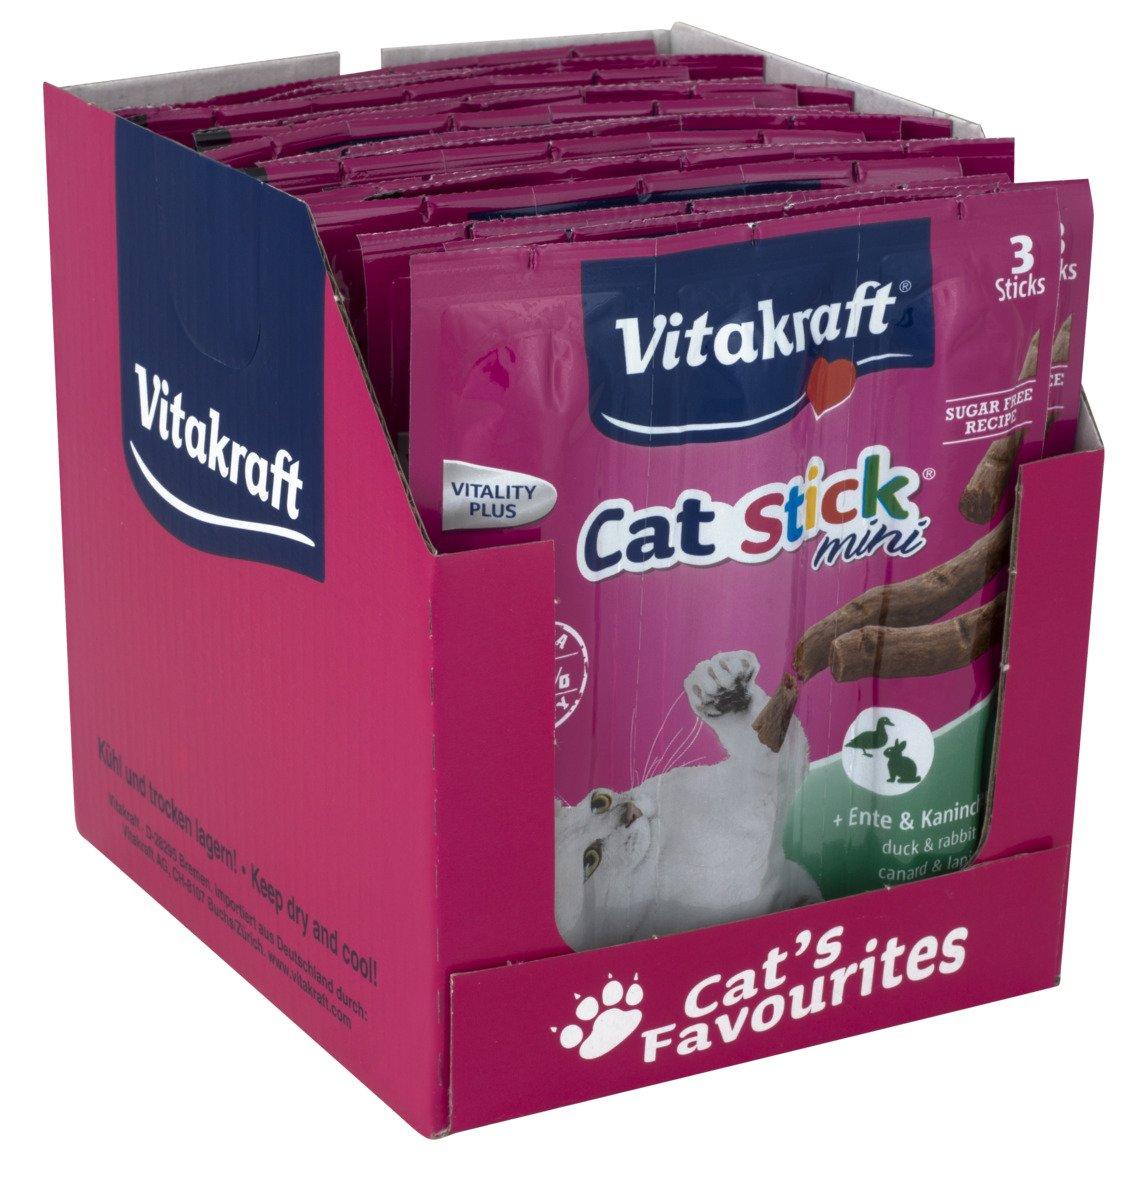 Amazon.com : Vitakraft Cat-stick Mini - 20 Pack (Duck) : Pet Snack Treats : Pet Supplies